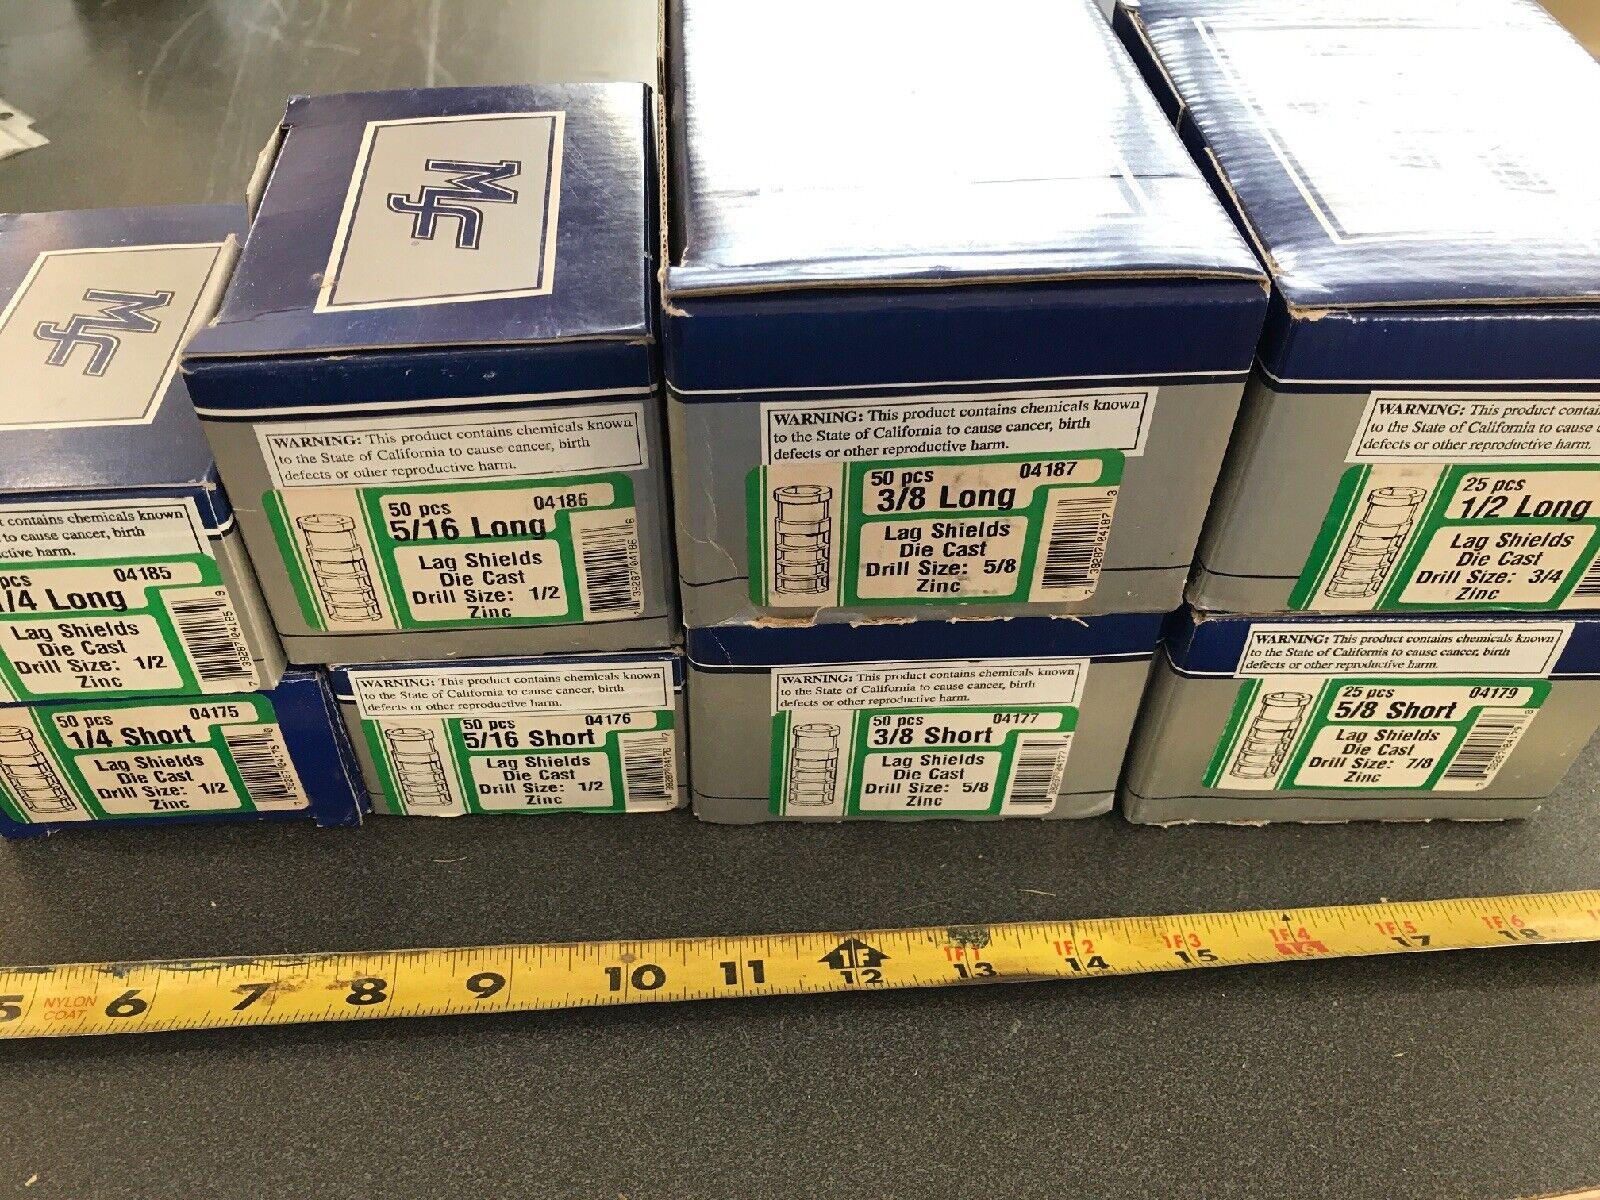 Carton: 100 pcs 1//4 x 2 Sleeve Anchors//Round Head//Steel//Zinc